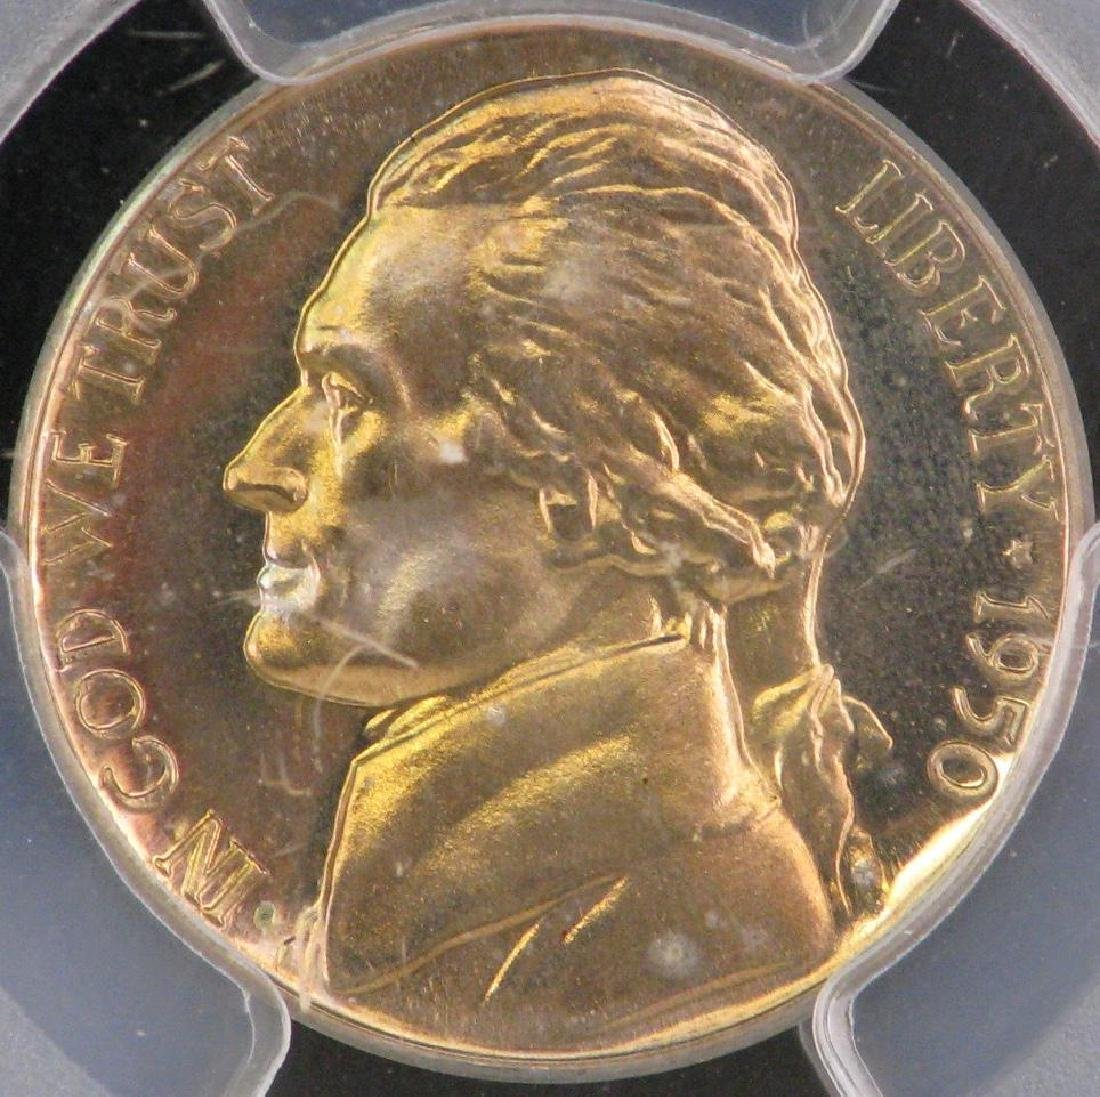 Lot of 2 : Jefferson Nickels (1950-P + 1965-P) - 8